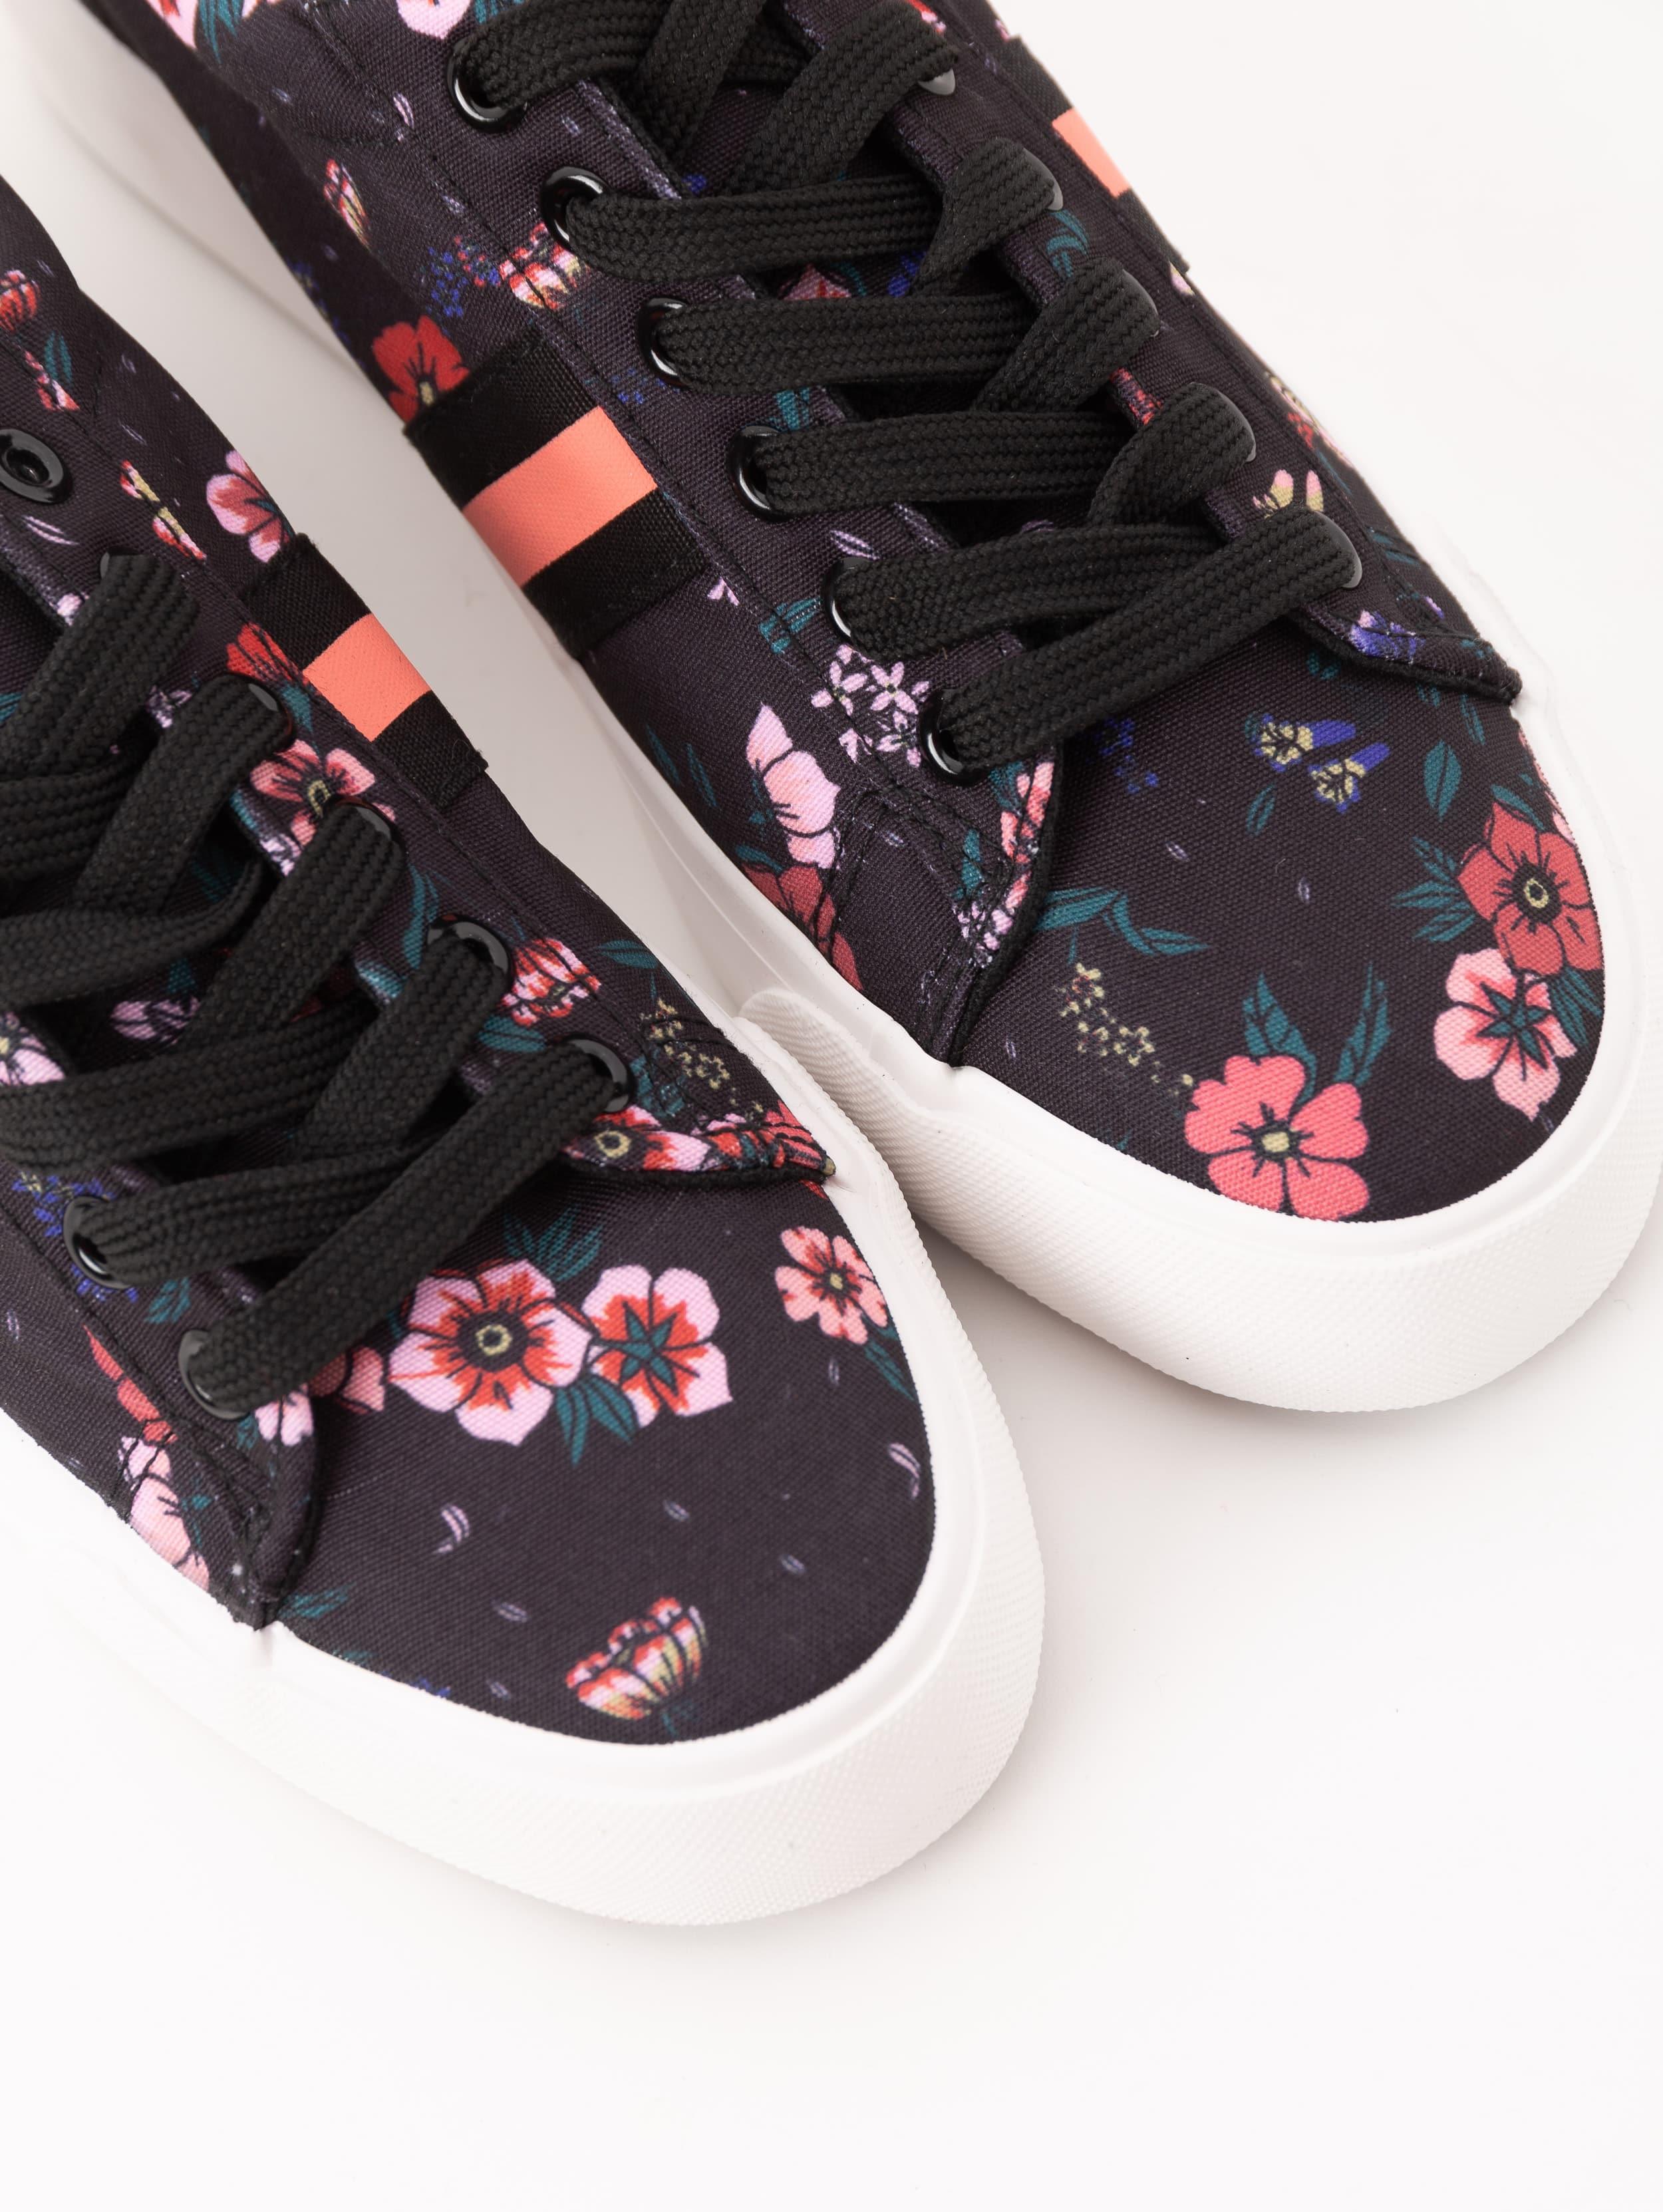 Sneakers a fiori Terranova a 19,99 euro